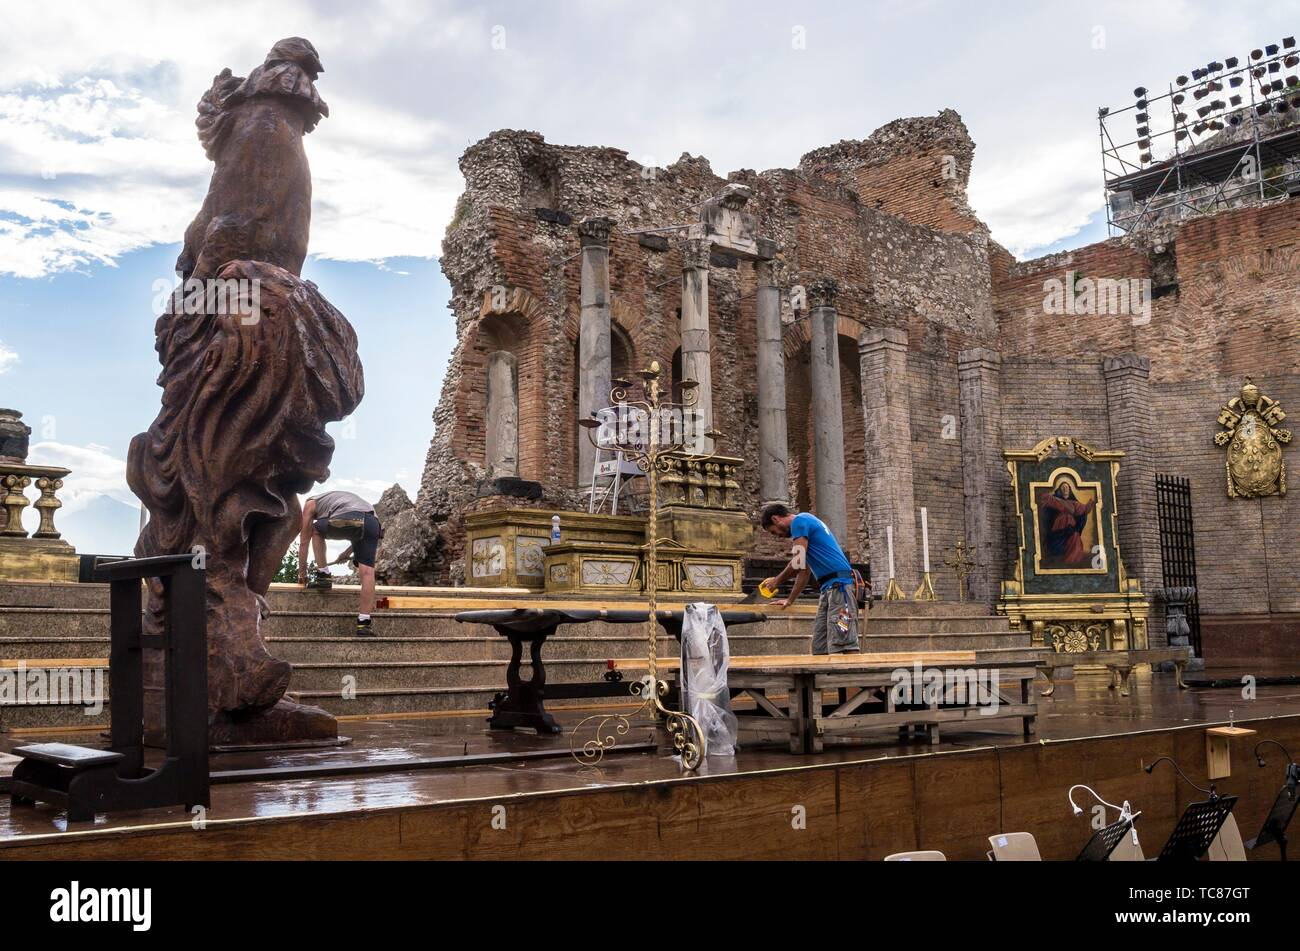 Ancient Arts Stock Photos & Ancient Arts Stock Images - Alamy